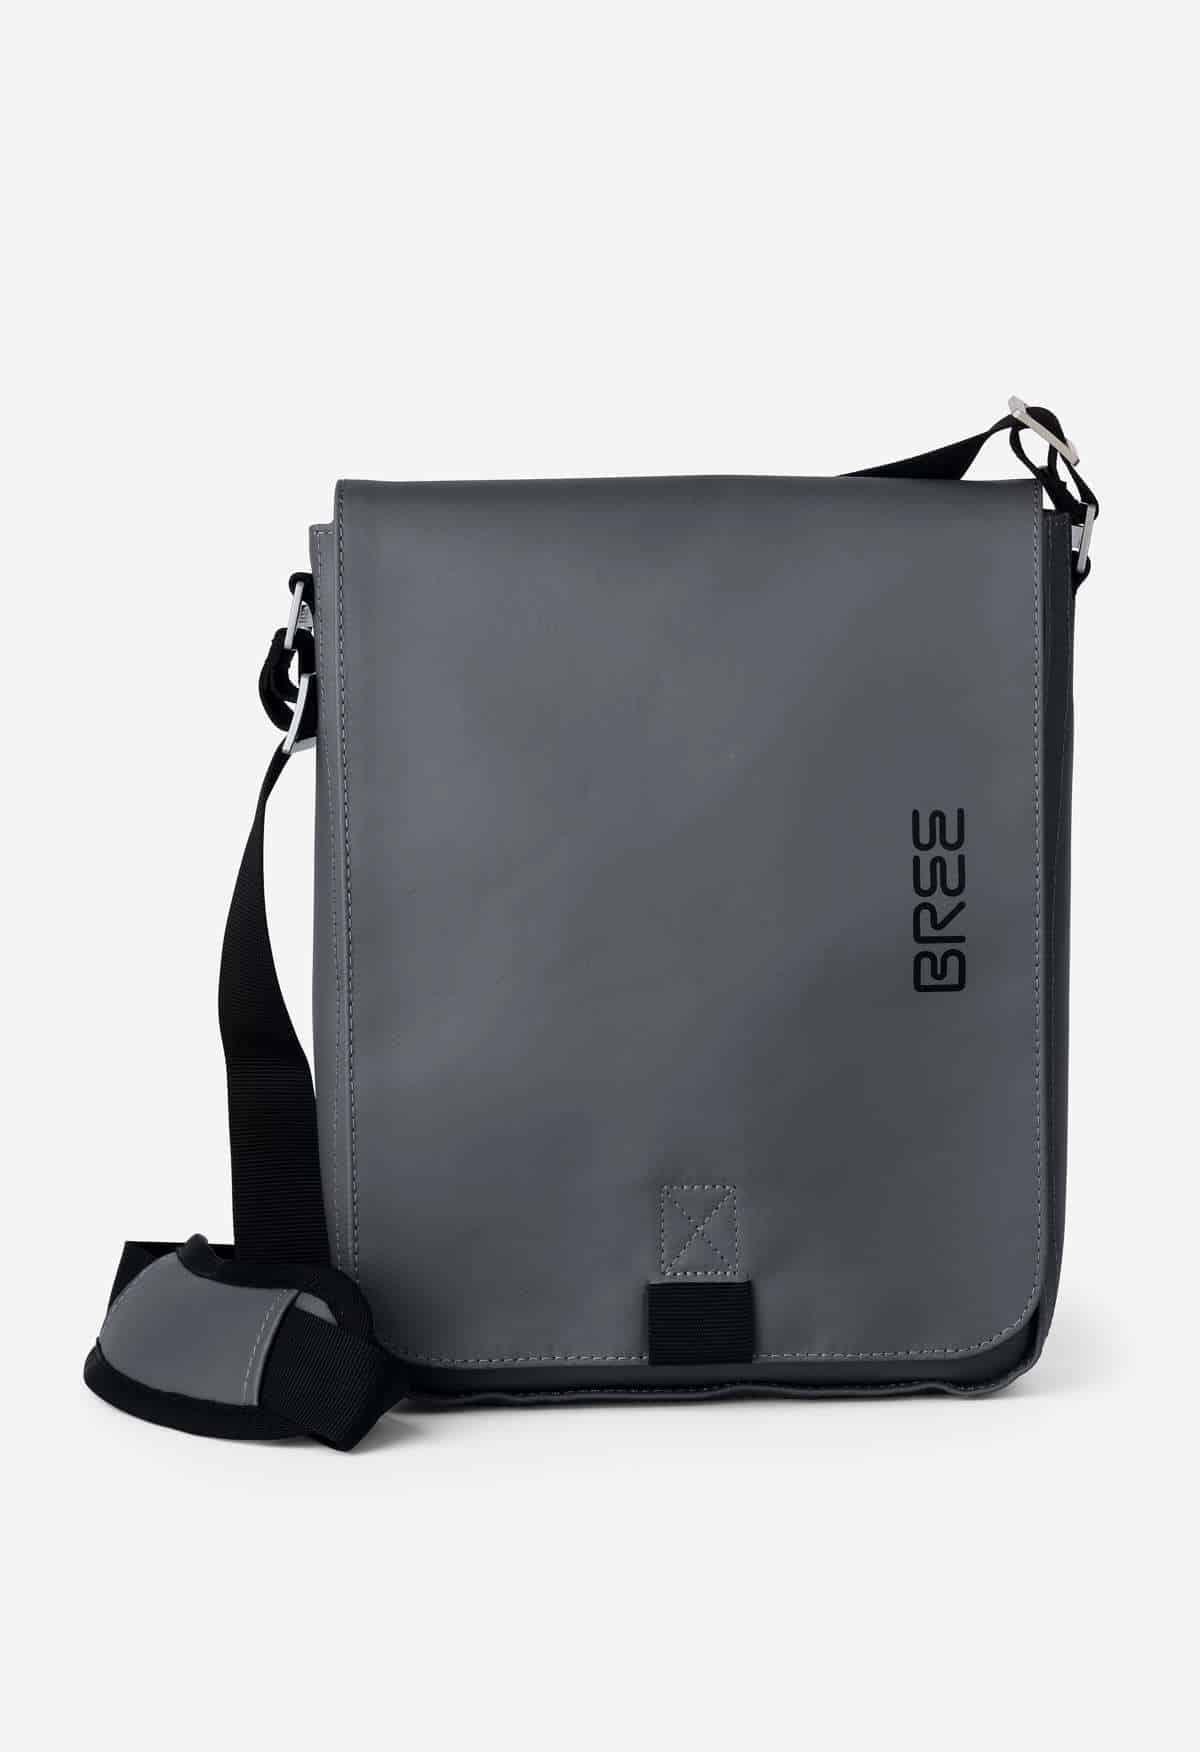 83f02f3a037b2 BREE Punch 52 Messenger Tasche - stylekrone.com